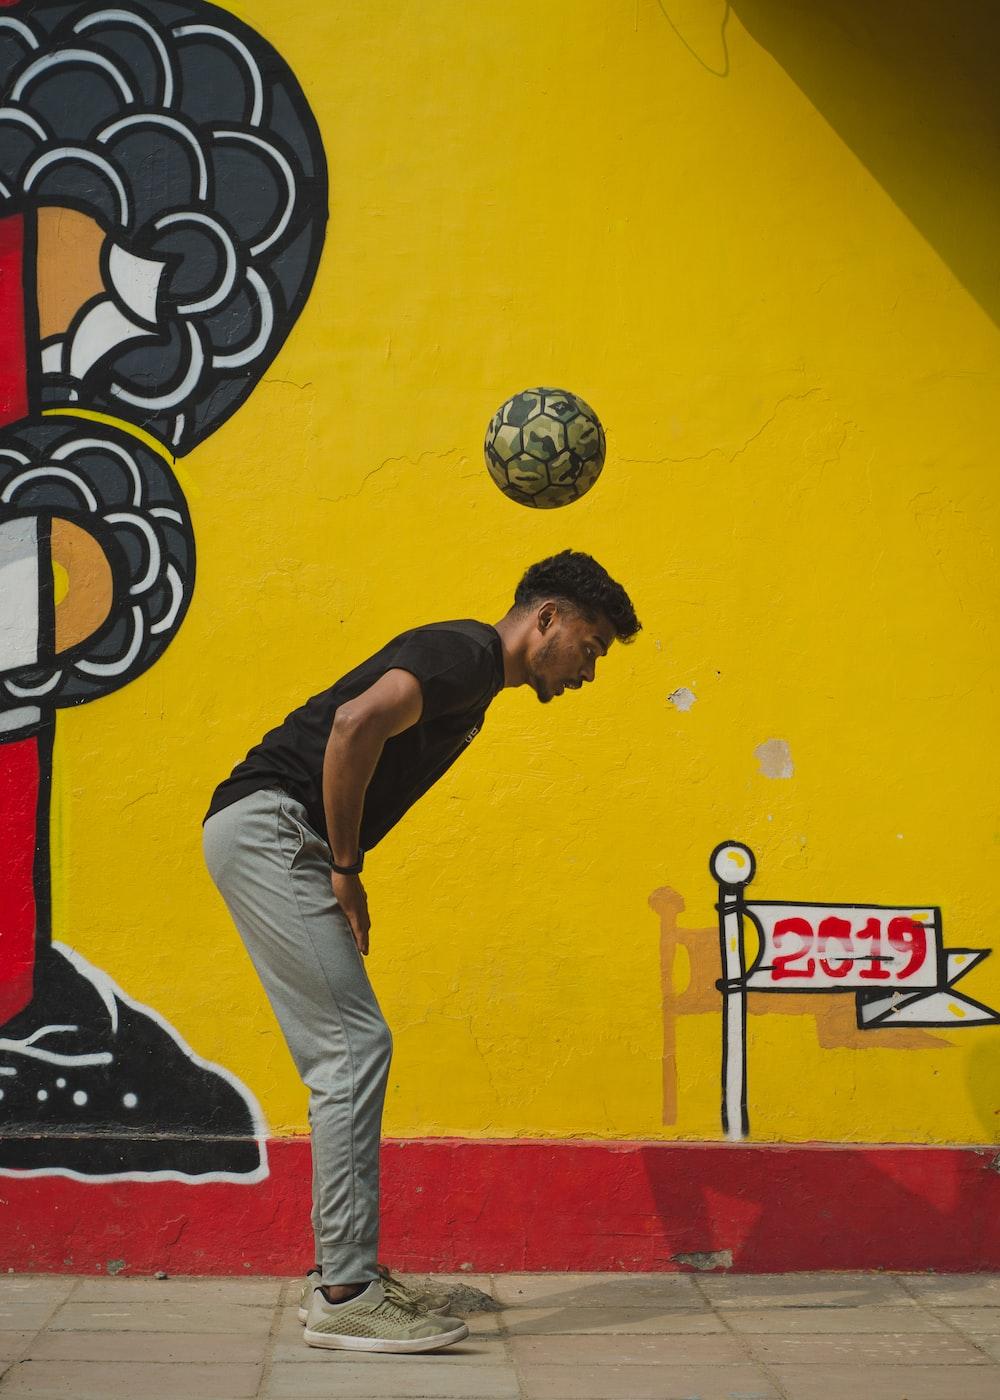 man in black shirt and gray pants playing soccer ball